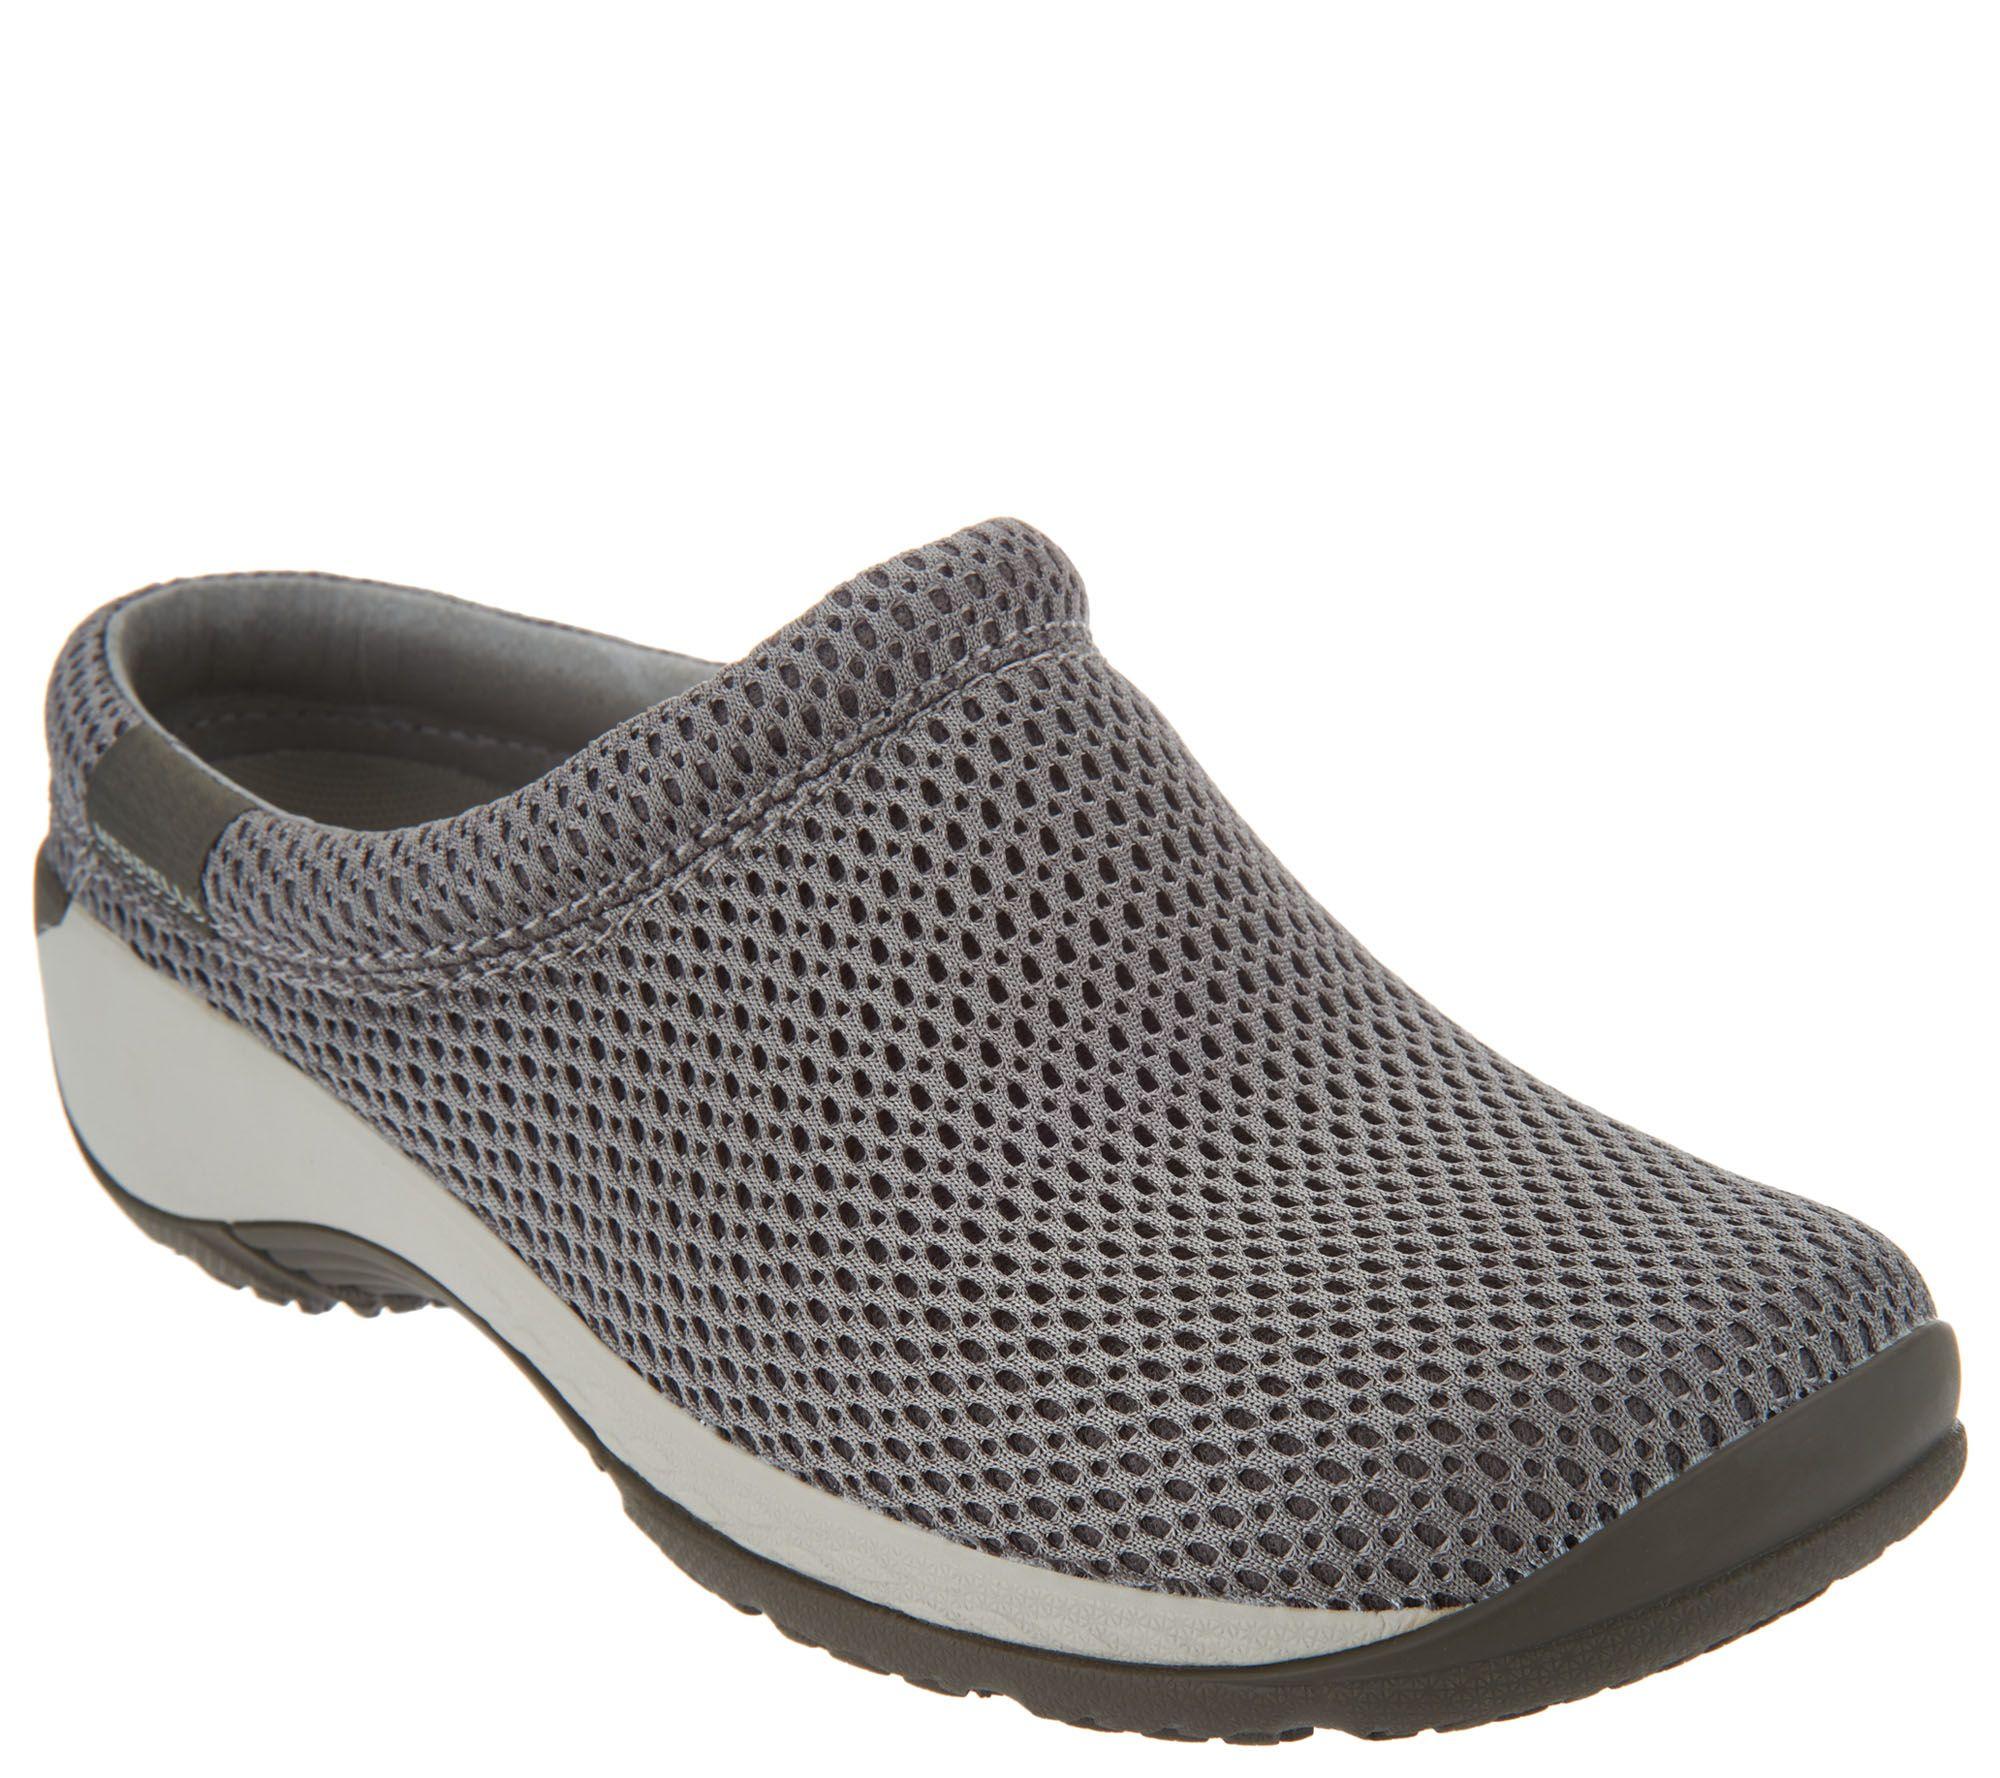 35a96d70d3b Merrell Mesh Slip-on Shoes - Encore Q2 Breeze - Page 1 — QVC.com